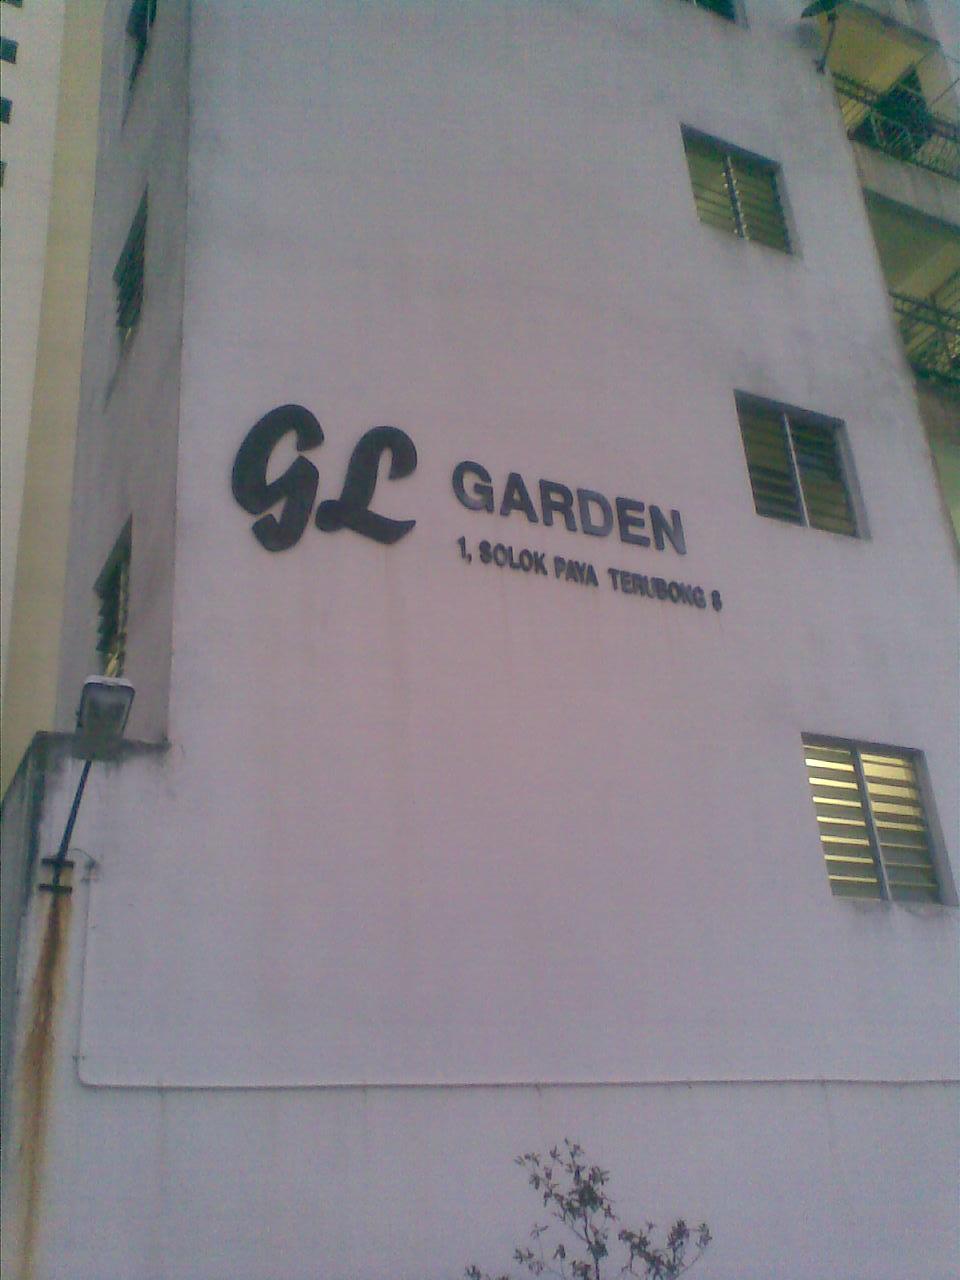 GL Garden, Paya Terubong